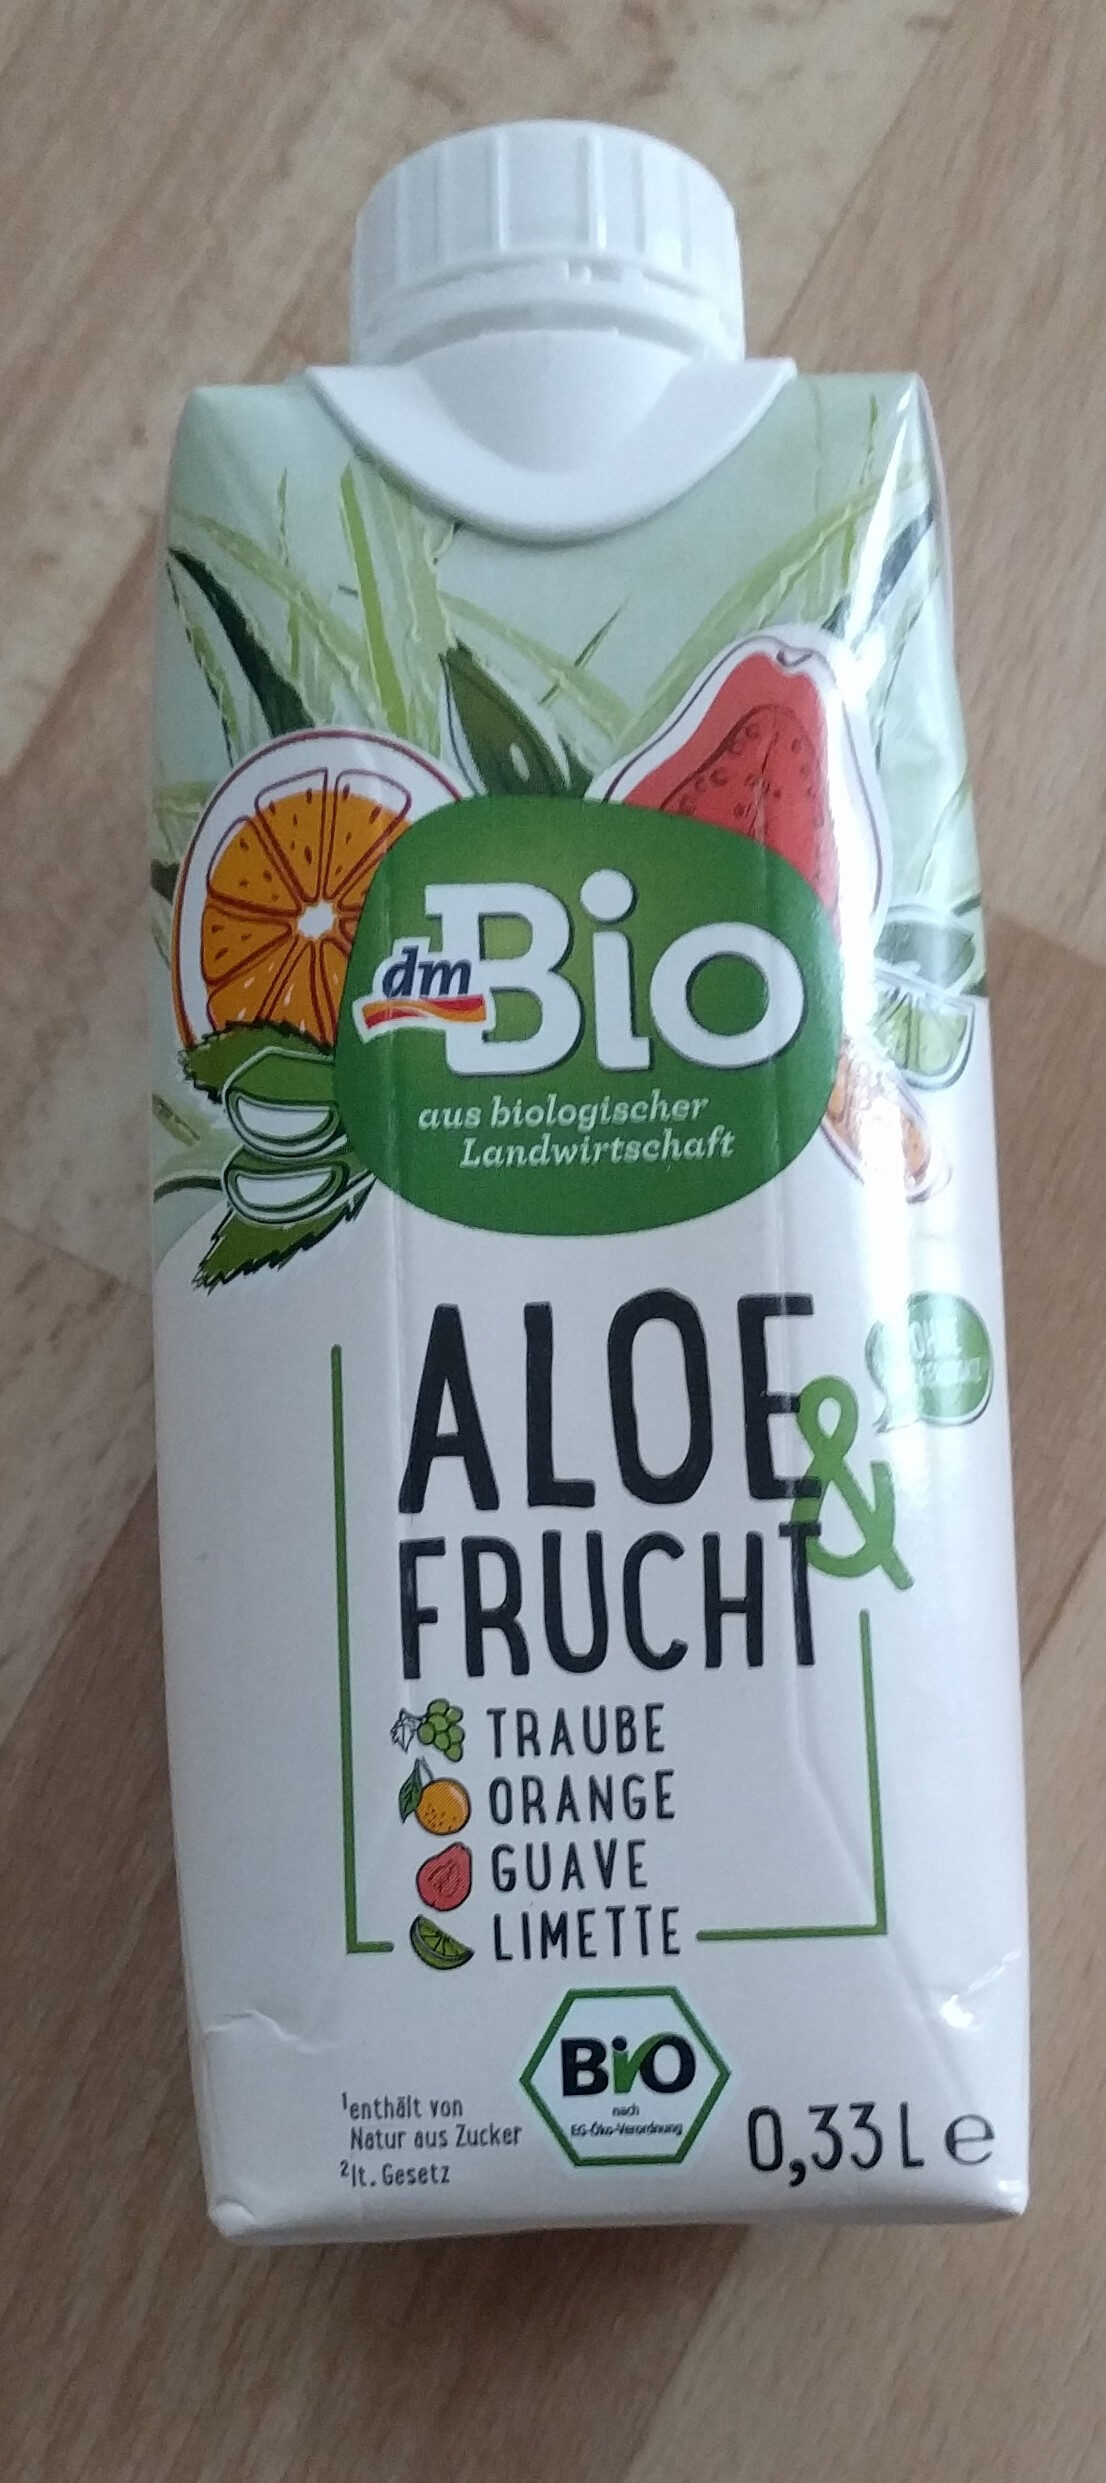 Aloe & Frucht - Product - de